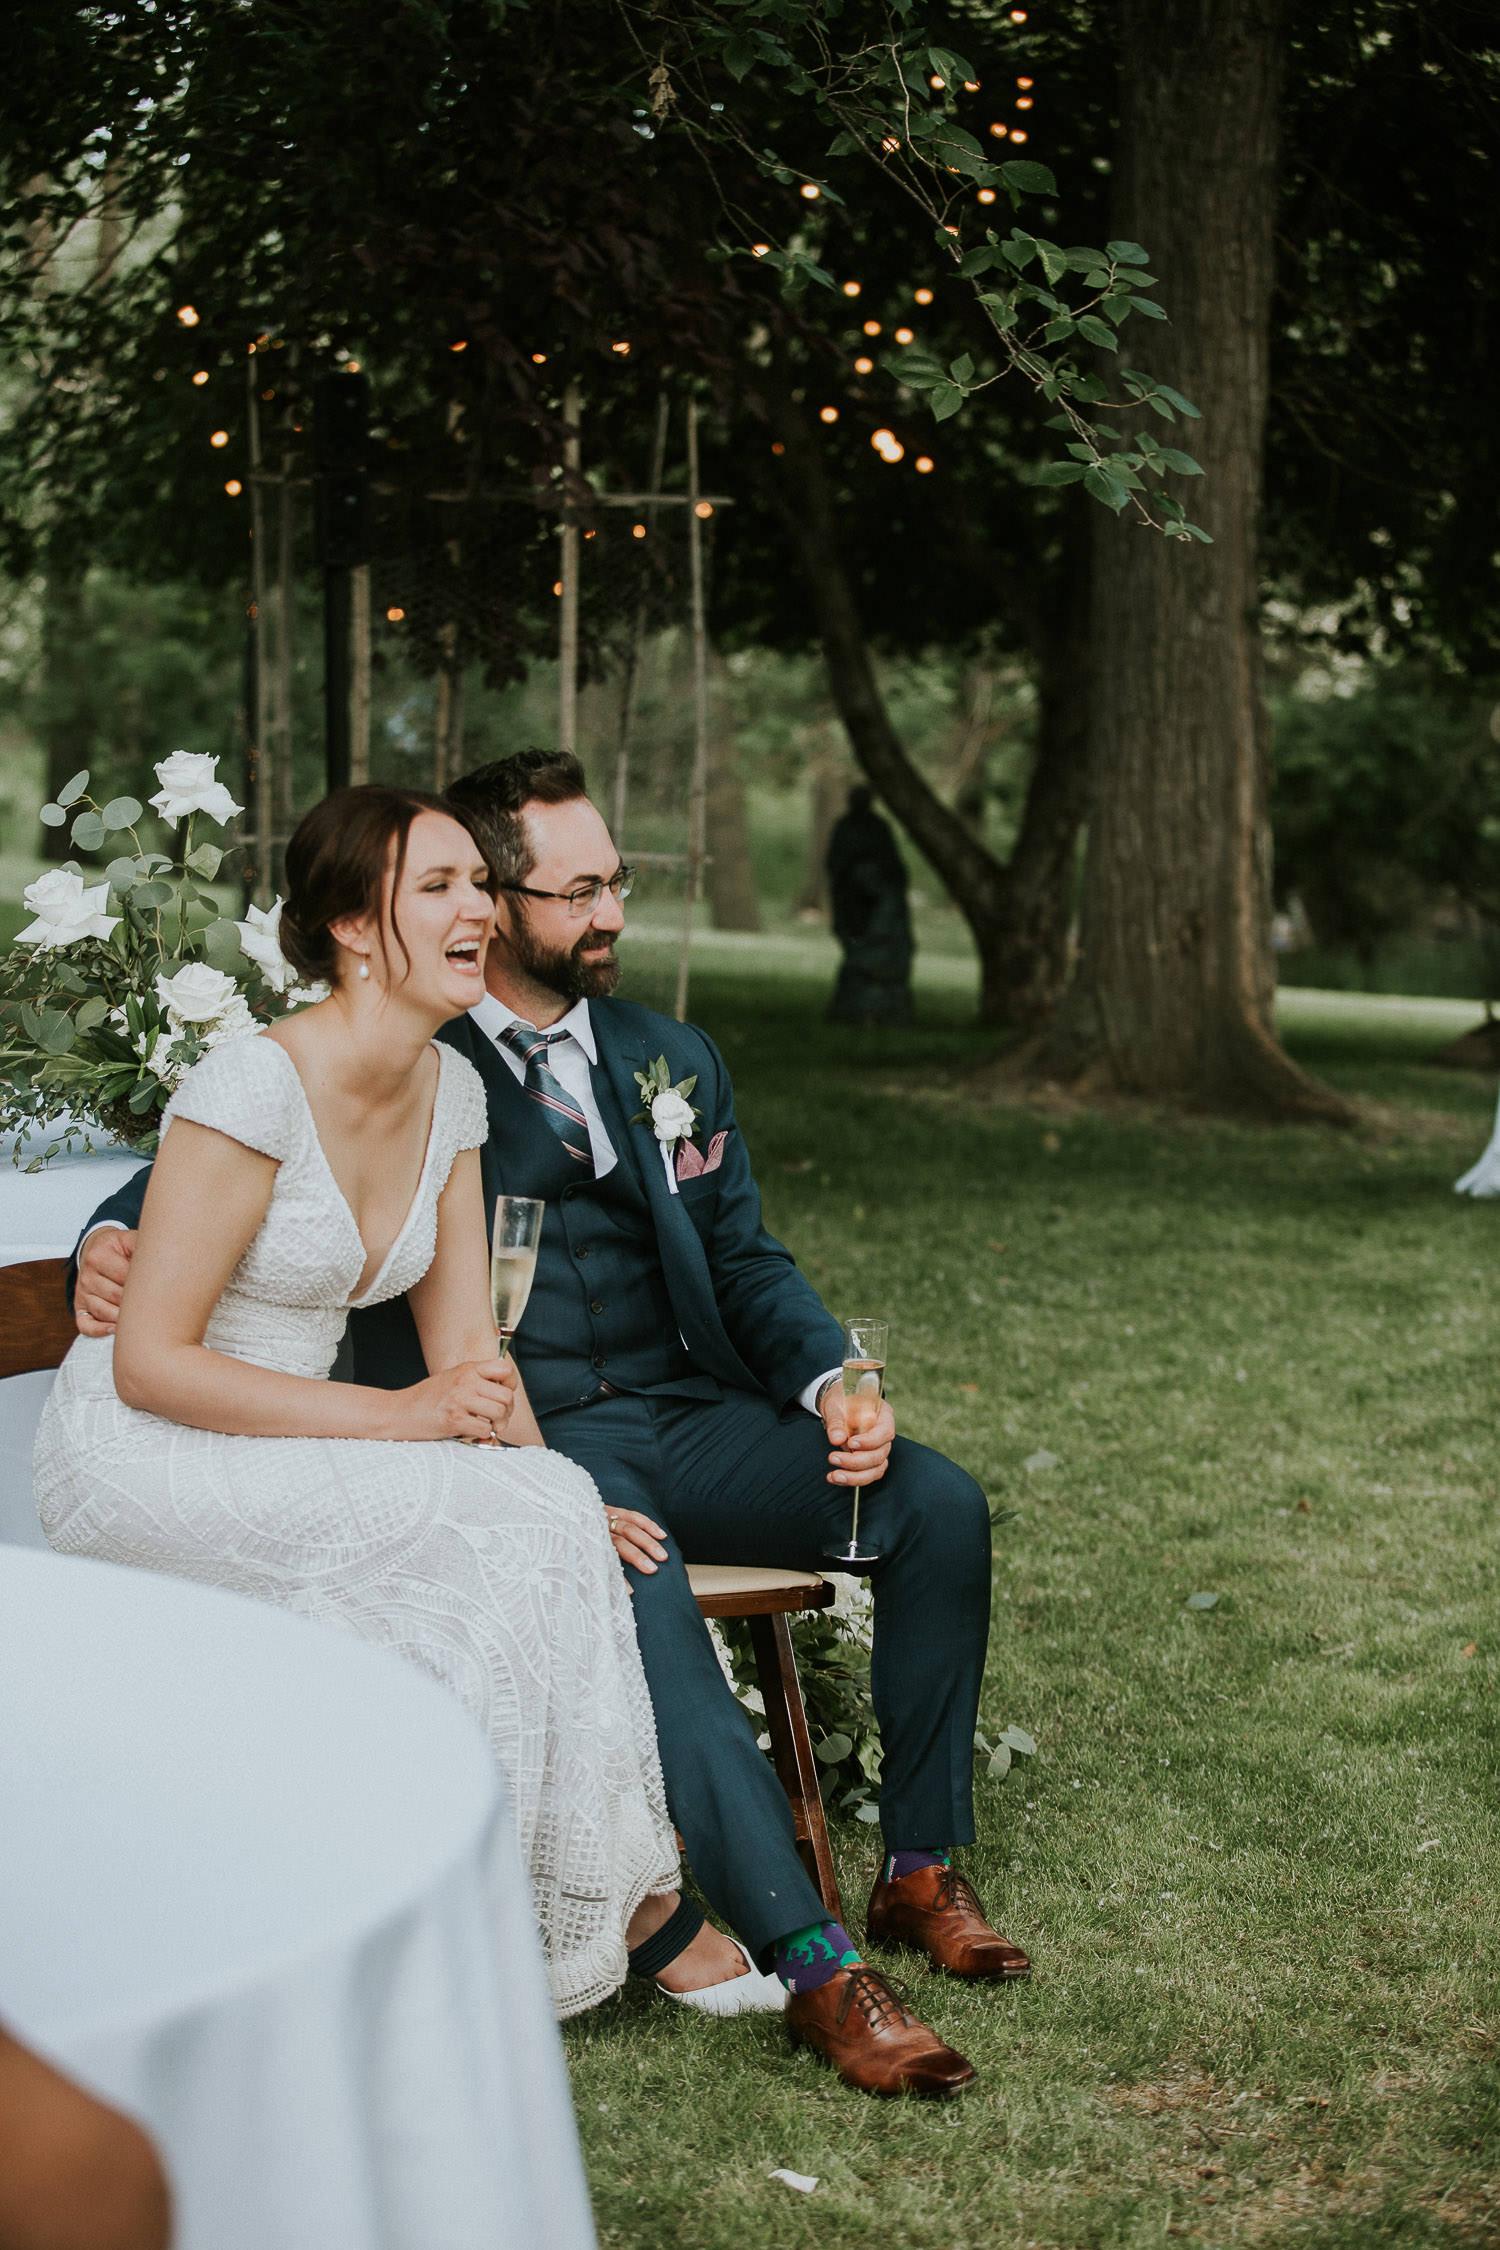 summer-backyard-wedding-in-alberta-sarah-pukin-0146